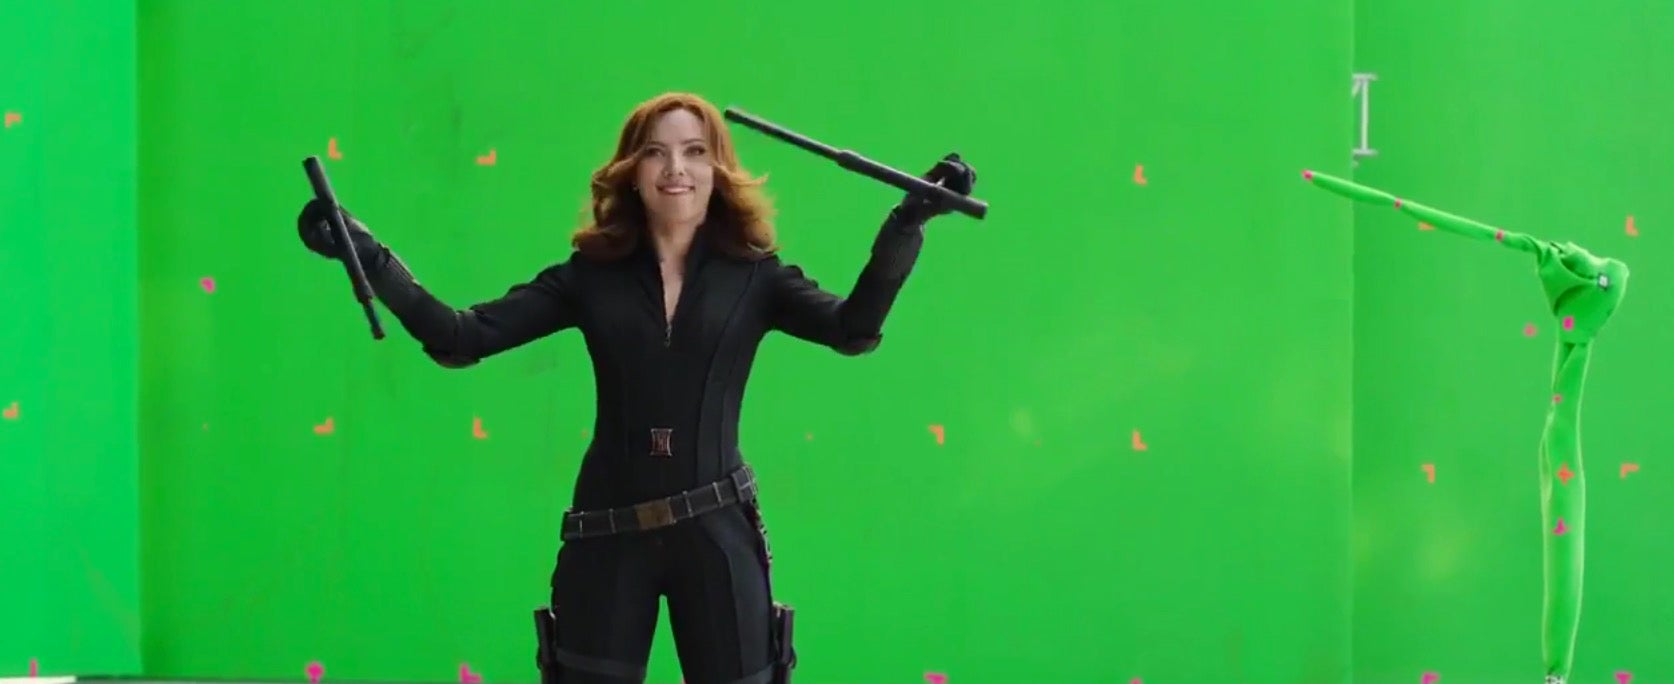 bloopers captain-america-civil-war chris-evans io9 marvel marvel-studios movies paul-bettany robert-downey-jr video